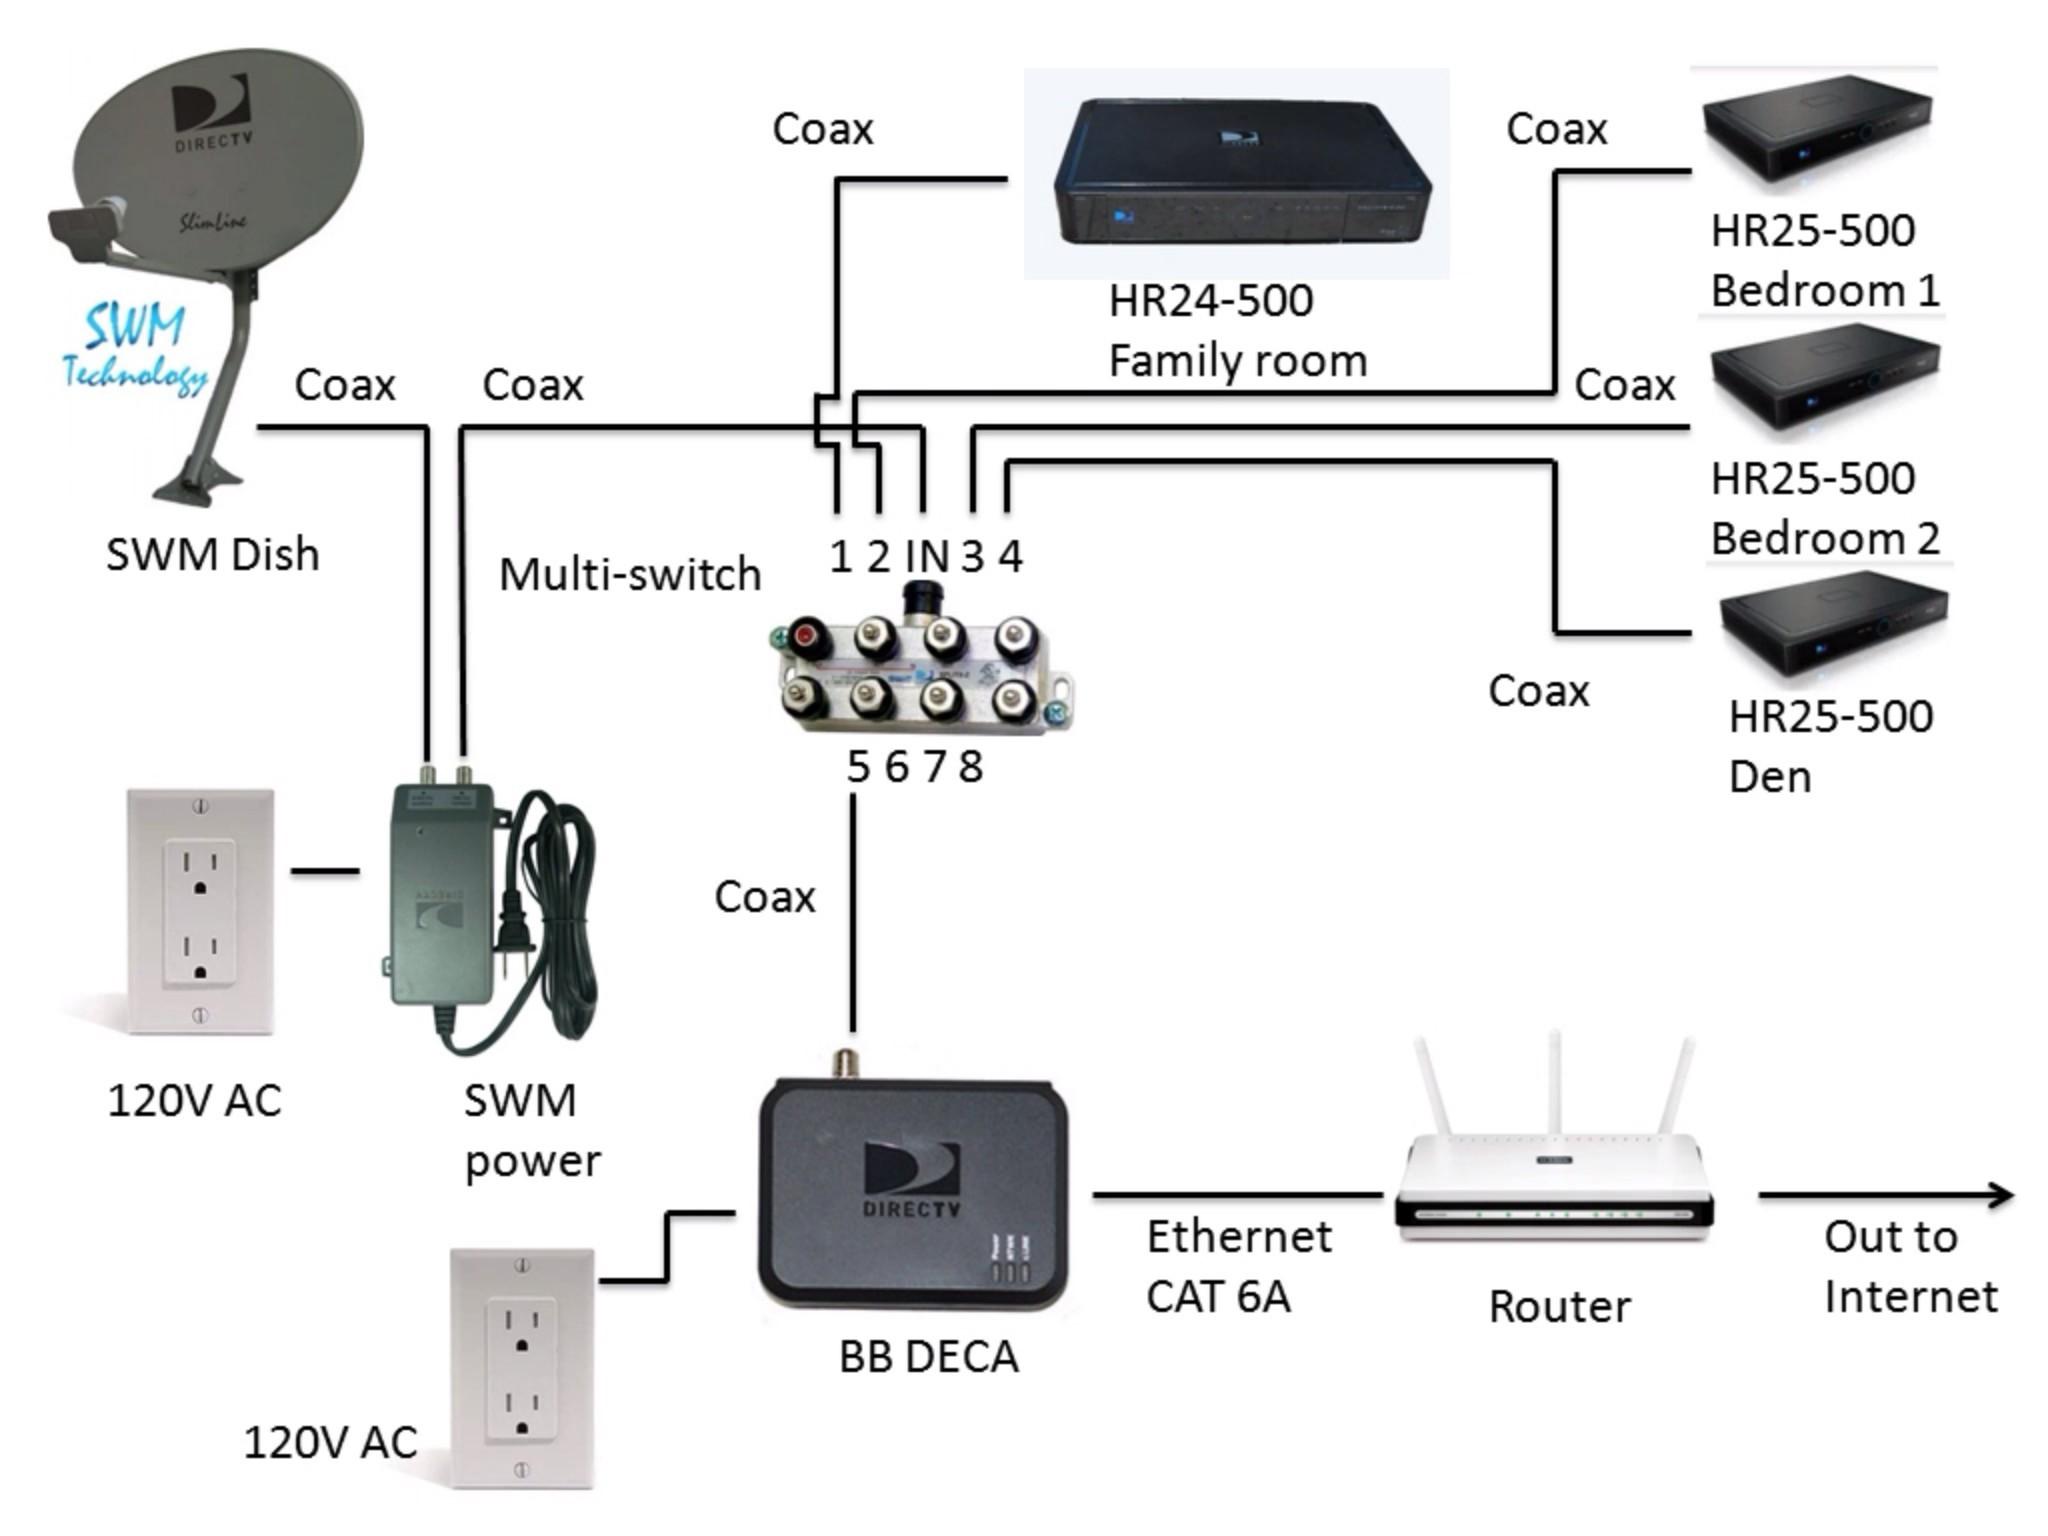 Cable Tv Wiring Diagrams Elegant Rv Cable and Satellite Wiring Diagram  Diagram